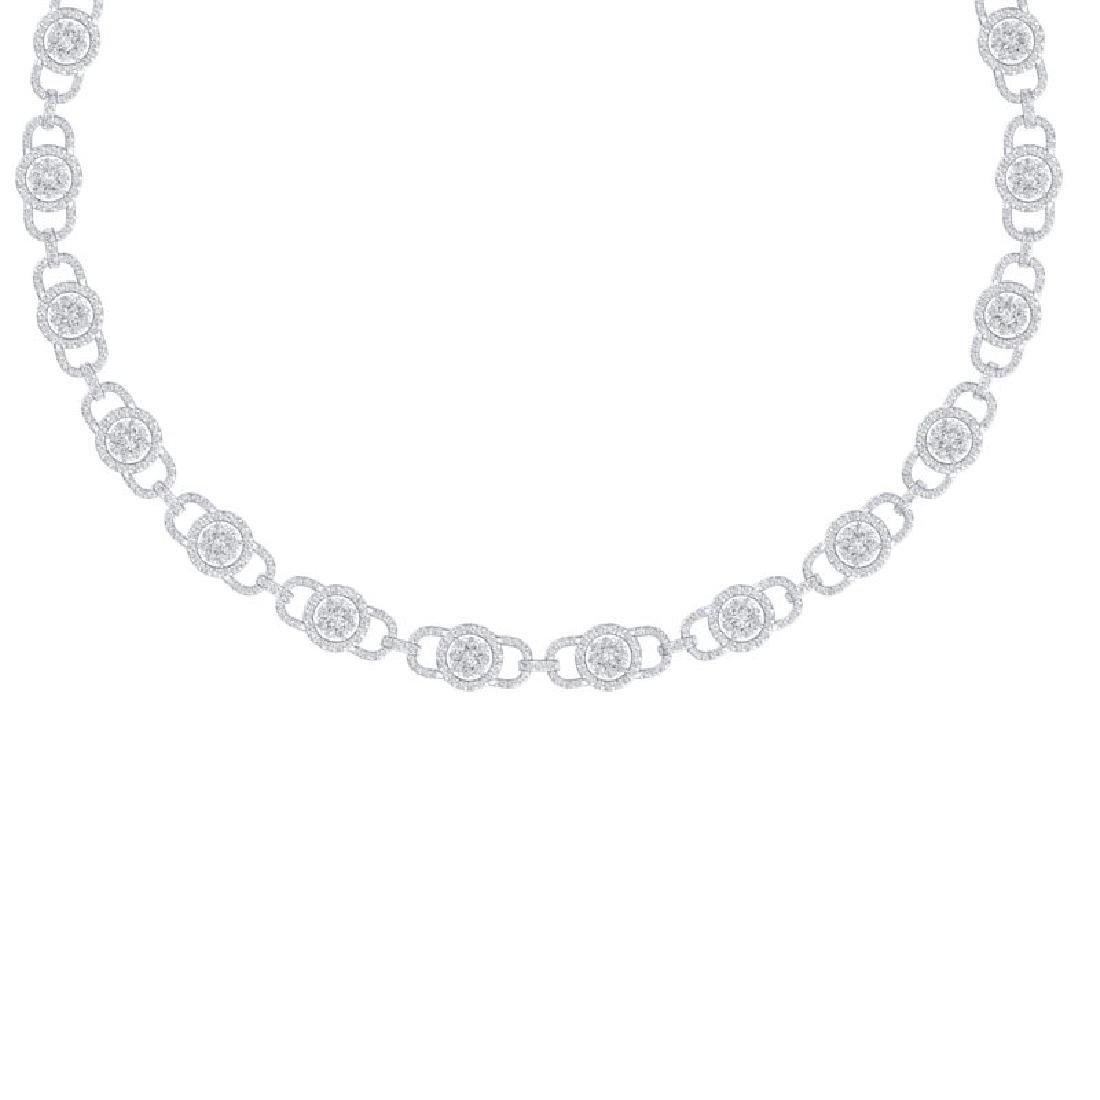 12 CTW Certified SI/I Diamond Halo Necklace 18K White